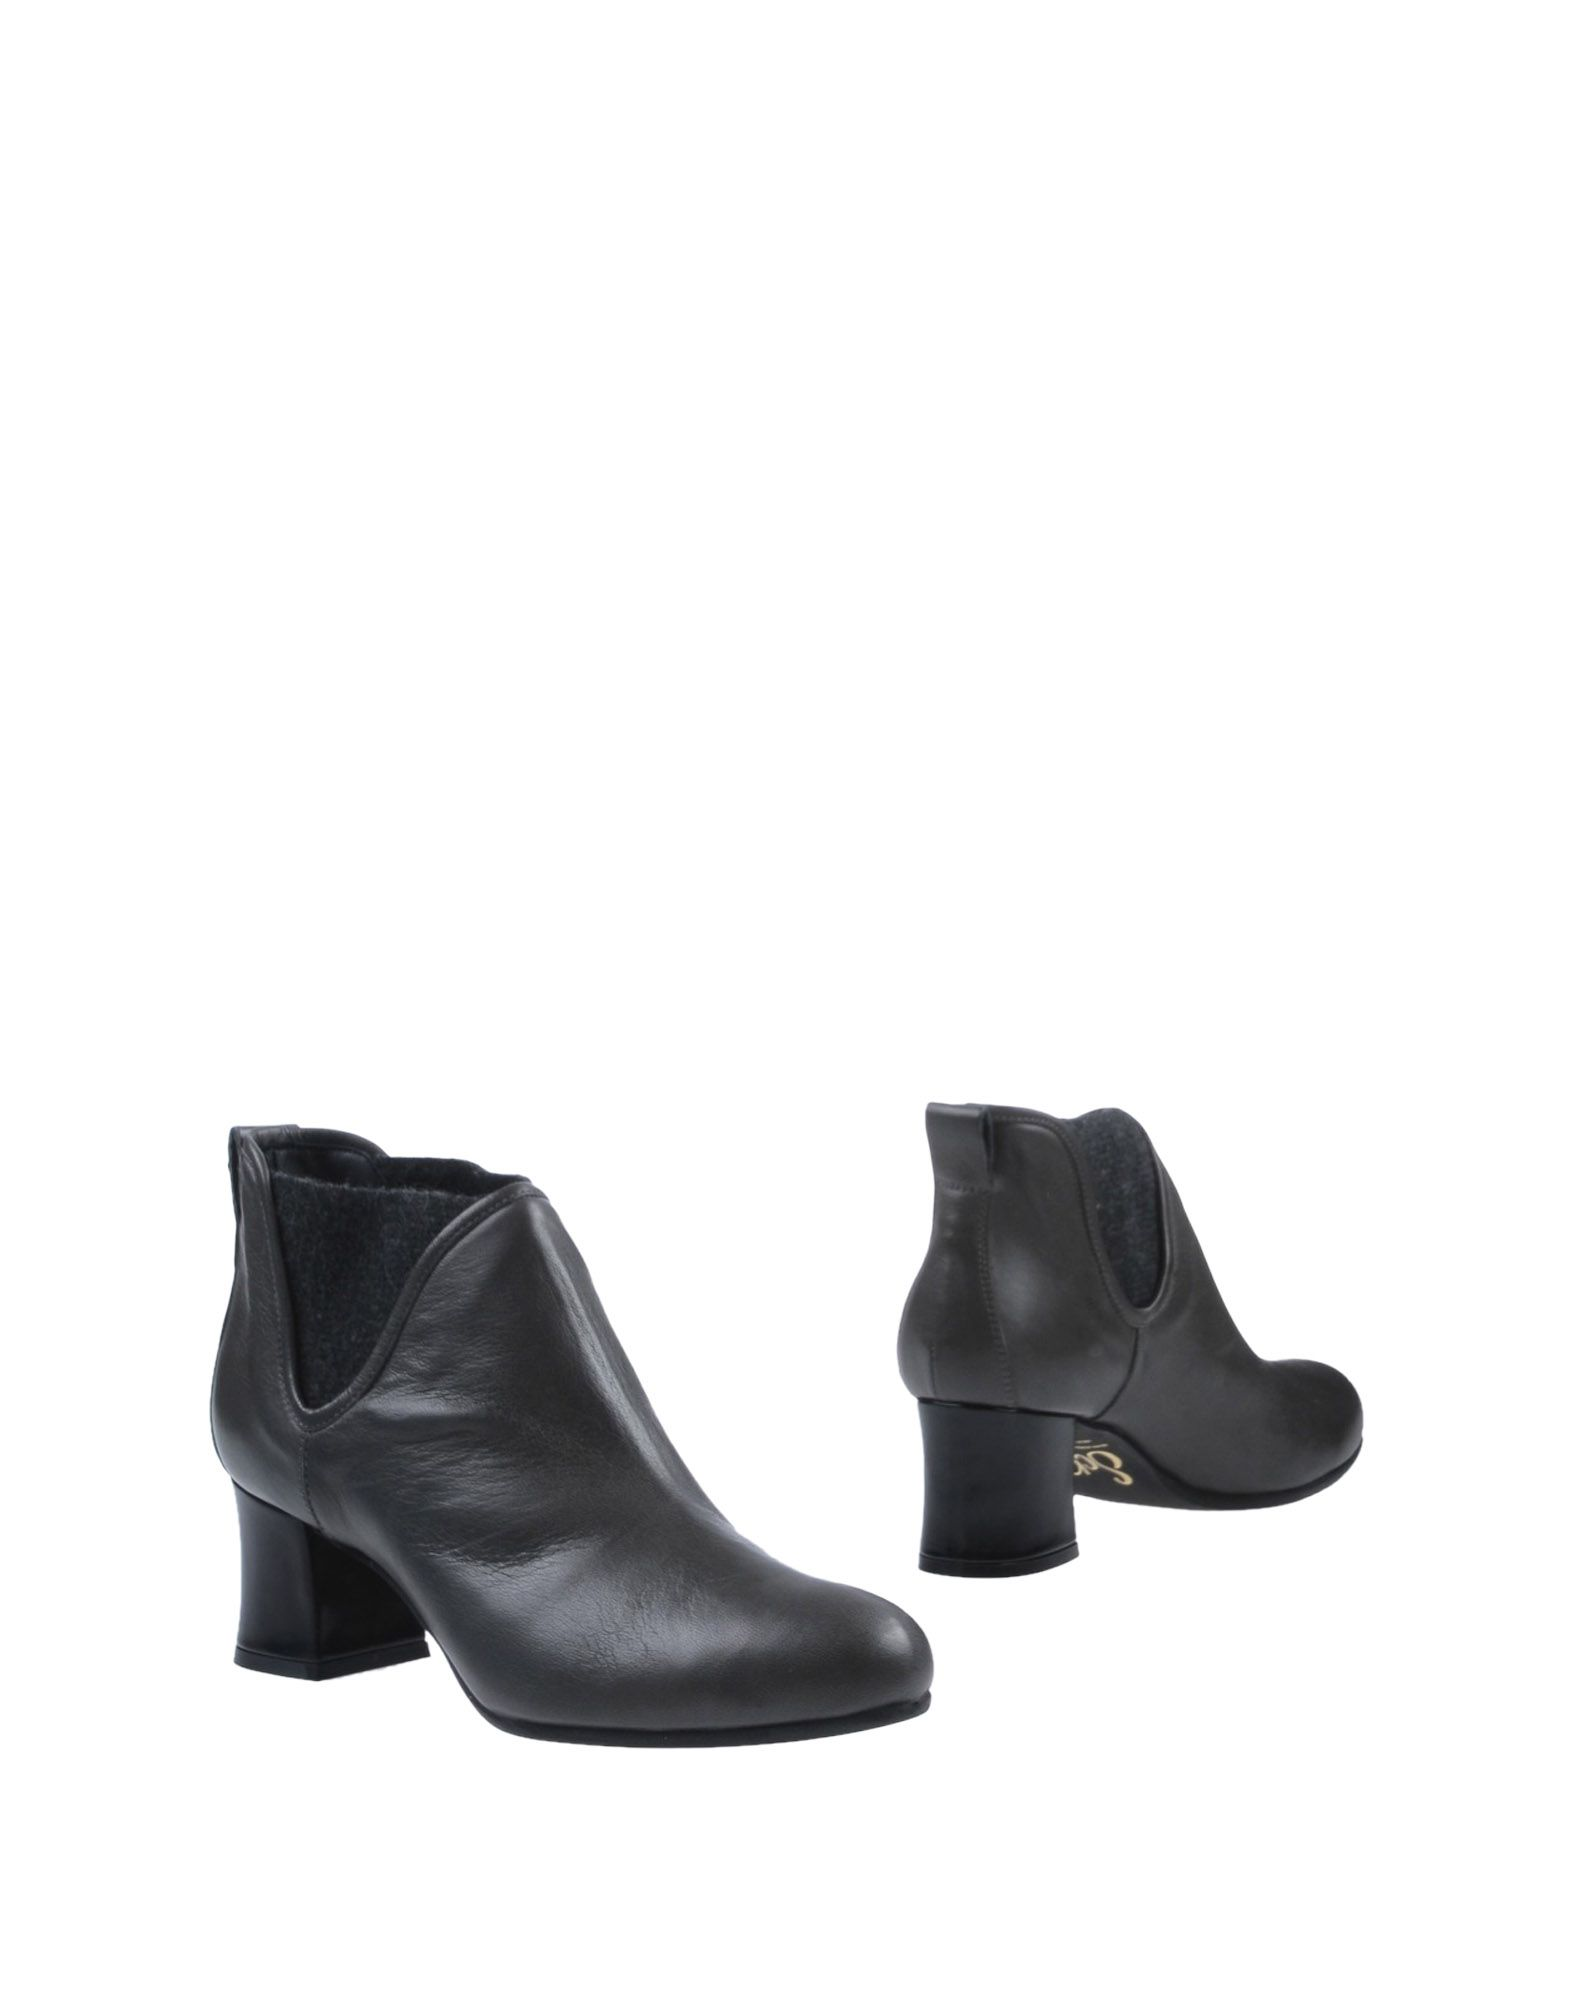 Sgn Giancarlo Paoli Qualität Chelsea Boots Damen  11310629HH Gute Qualität Paoli beliebte Schuhe a647dd